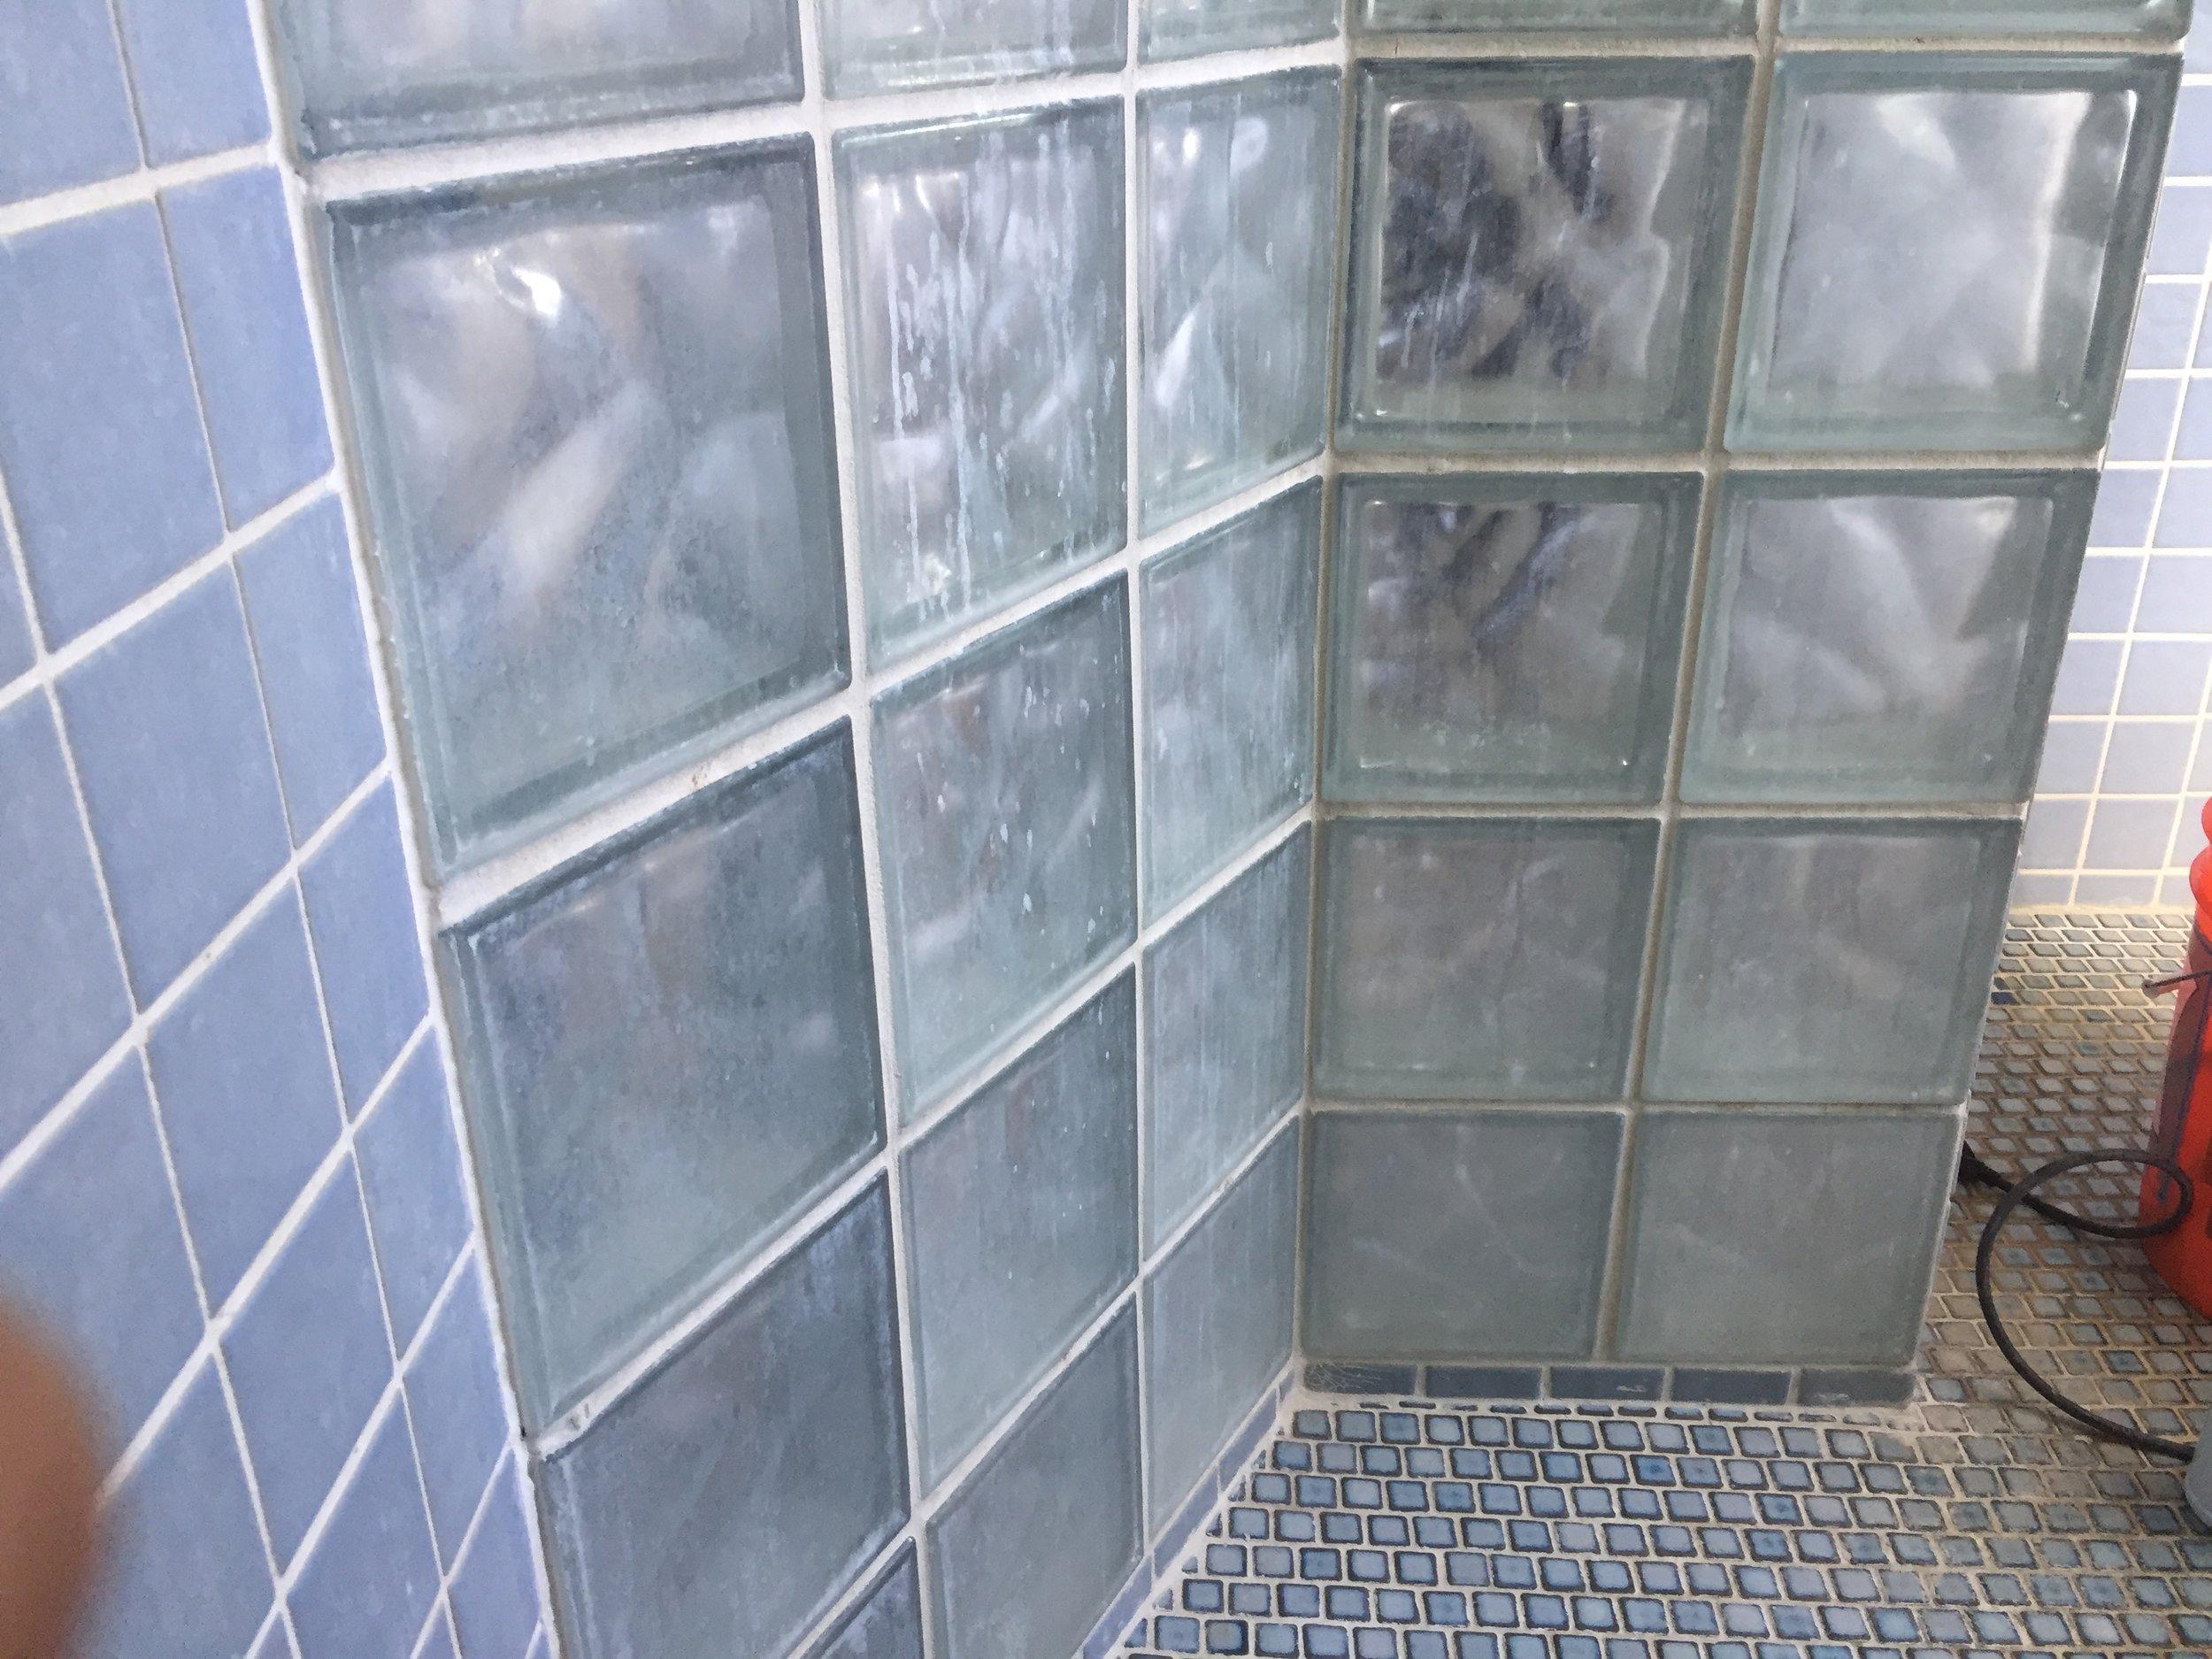 Shower glass blocks before